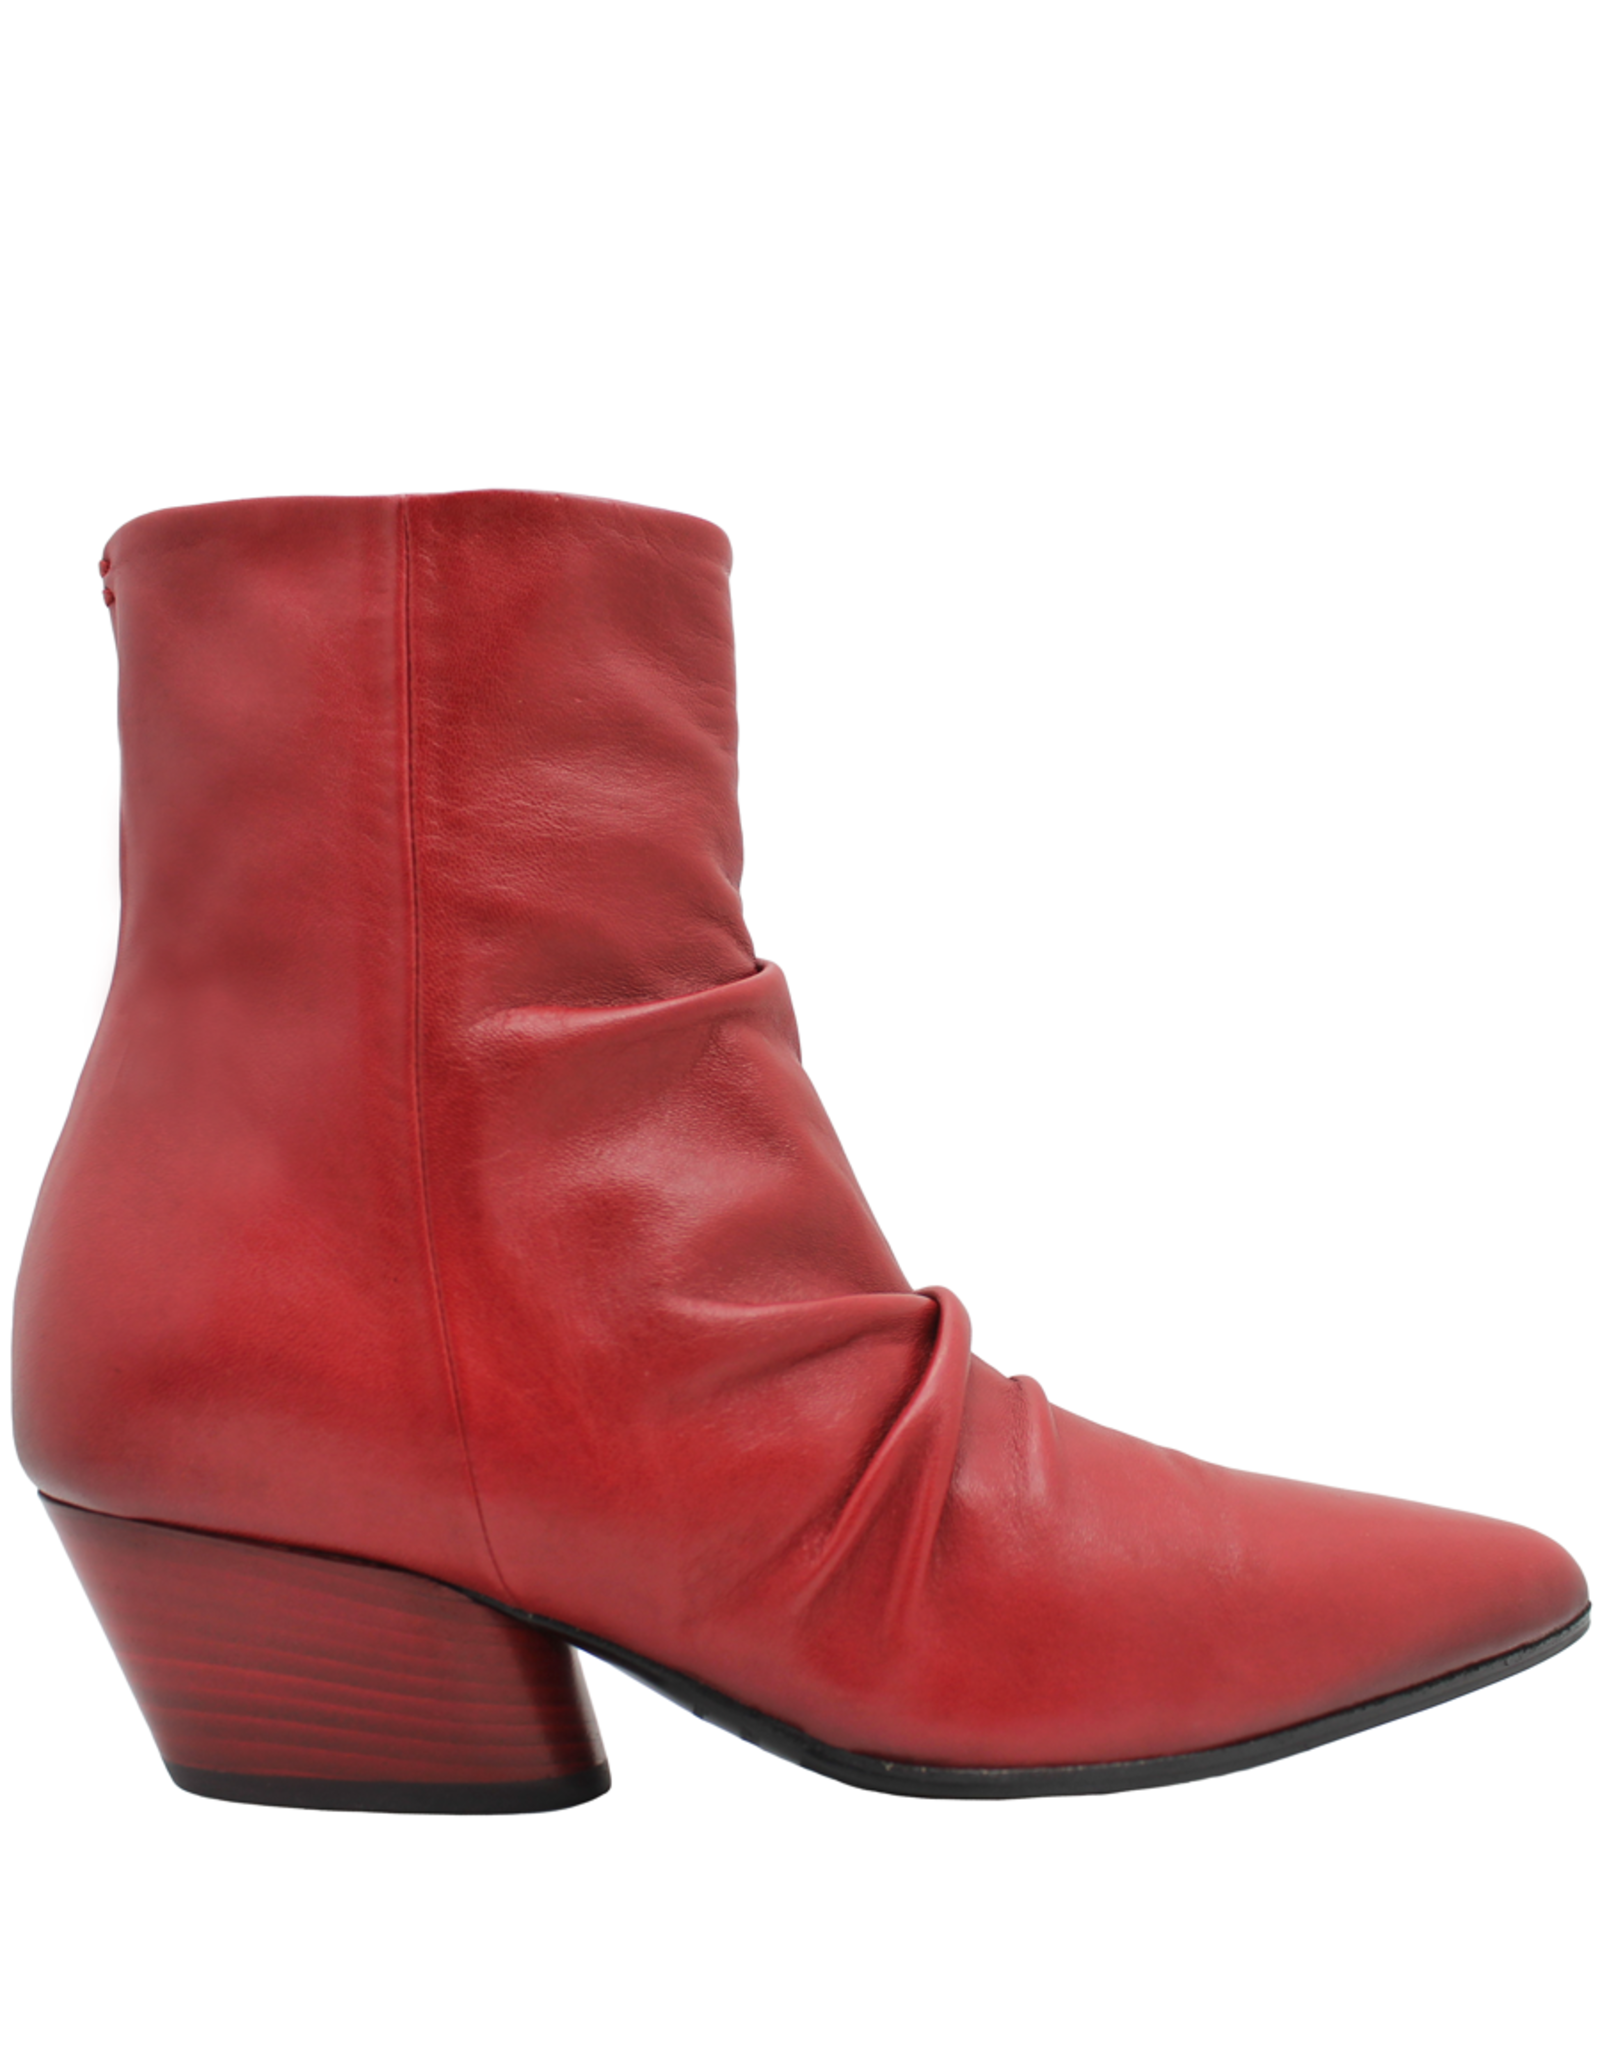 Halmanera Halmanera Red Ruched Side Zipped Boot Mick